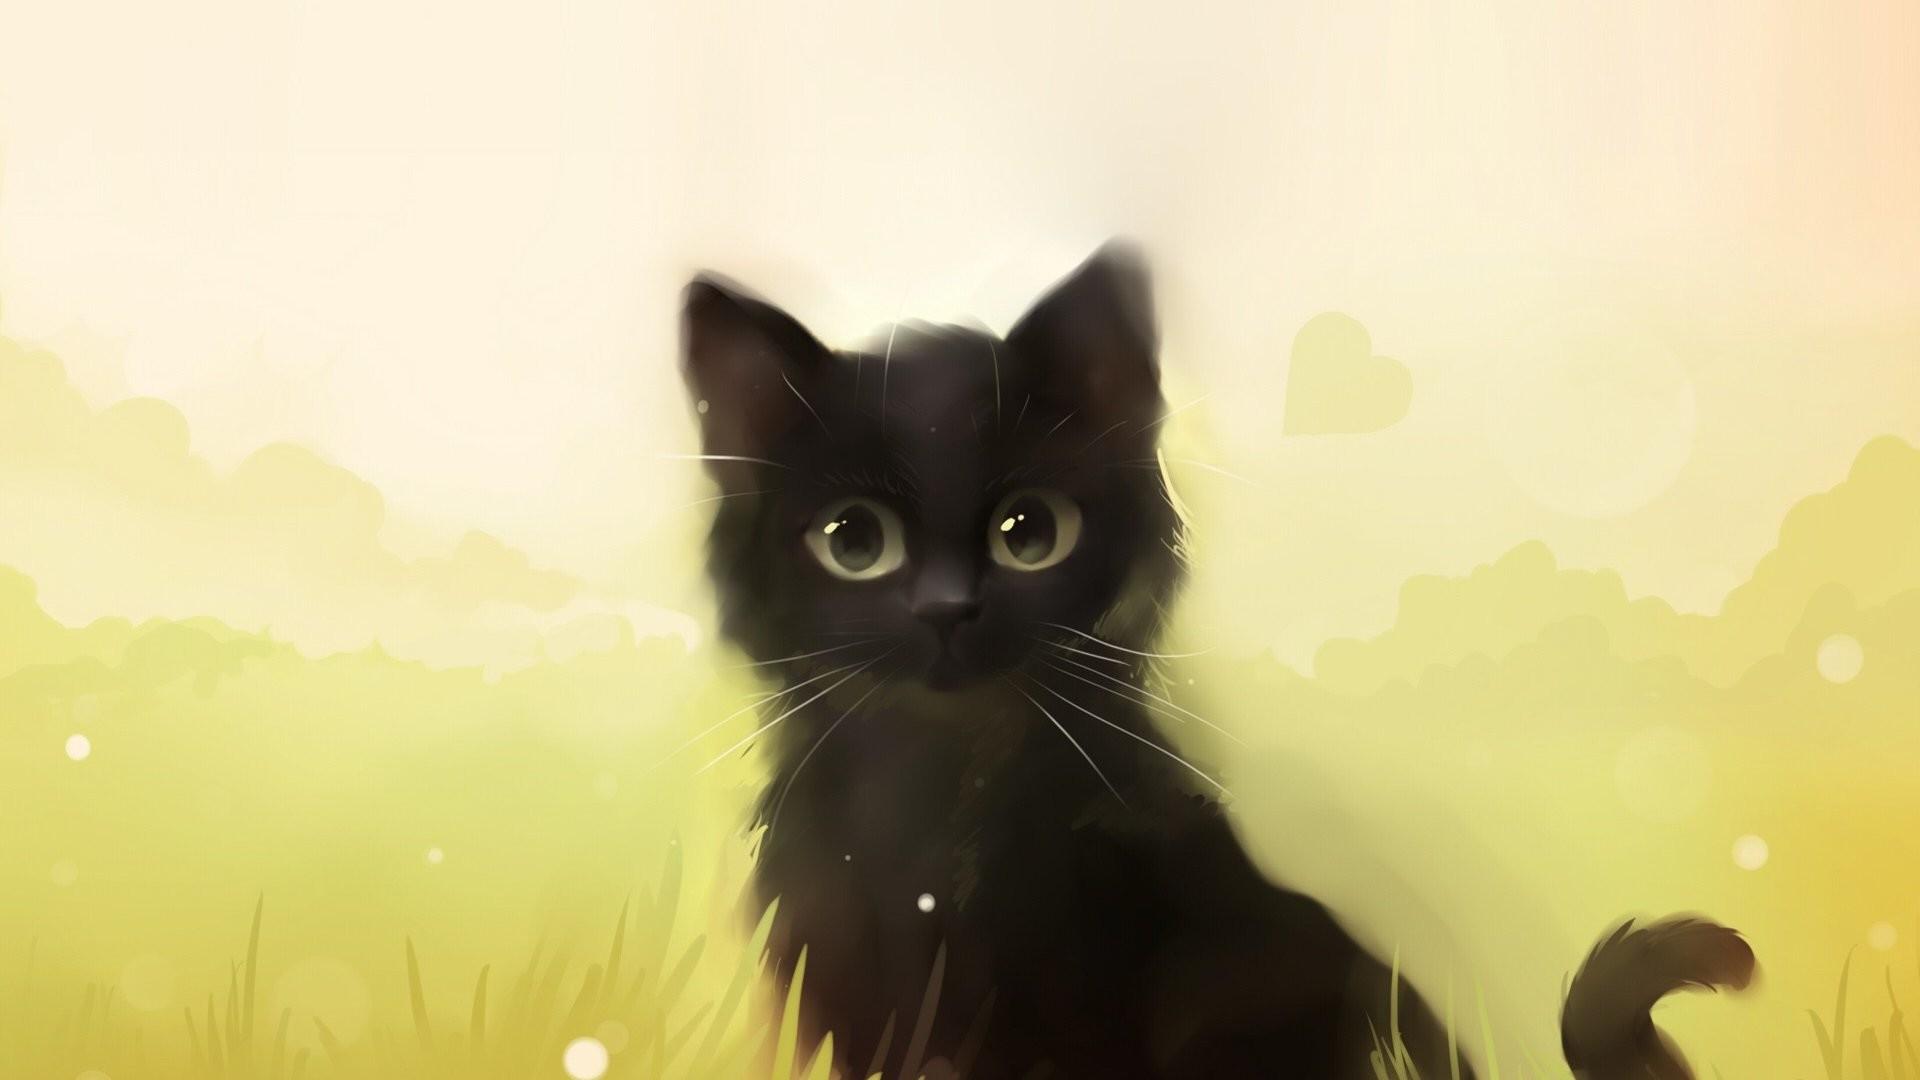 Cute Anime Black Cat 1280x776 Wallpaper Teahub Io